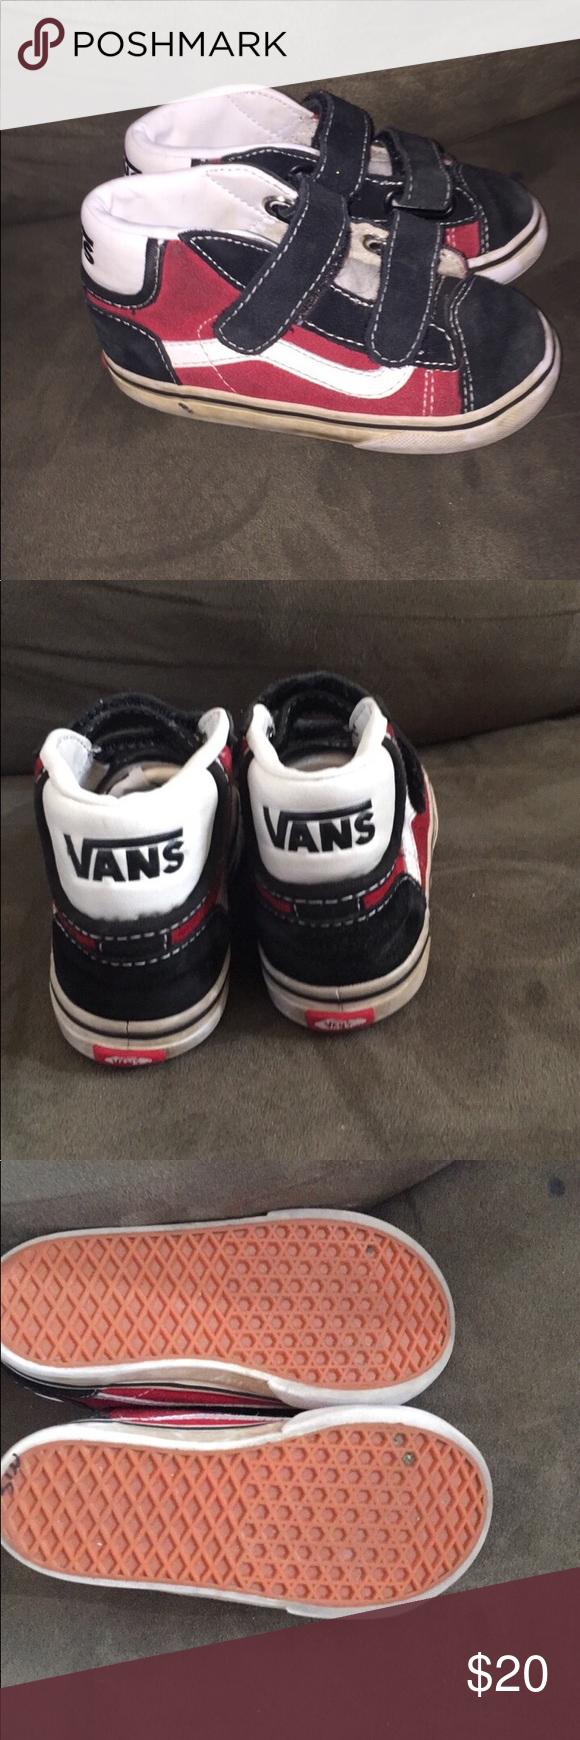 c0874217b4 Toddler boys Vans. Size 8 Excellent condition! Vans high tops Velcro straps size  8 toddler Vans Shoes Sneakers